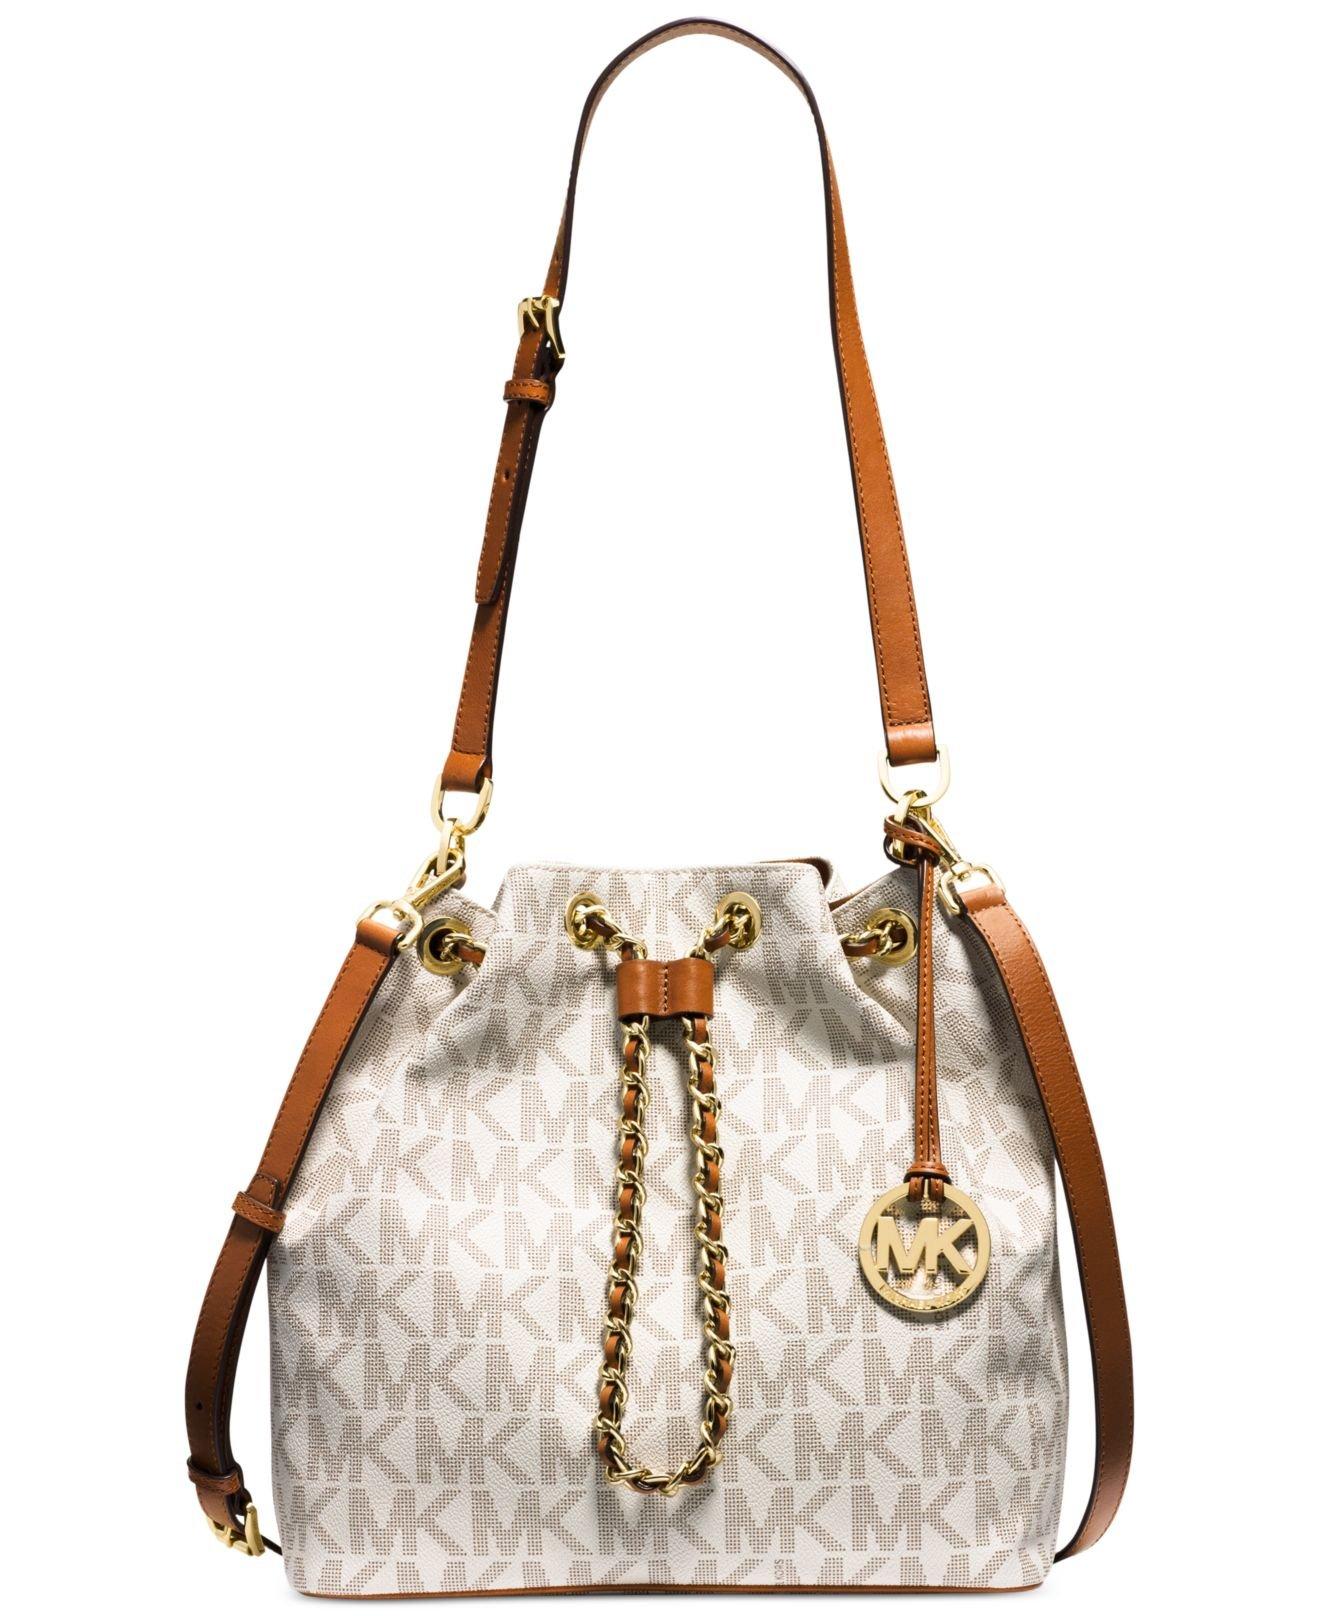 187ea5192225 ireland michael kors chain drawstring bag price f0ece 682a0